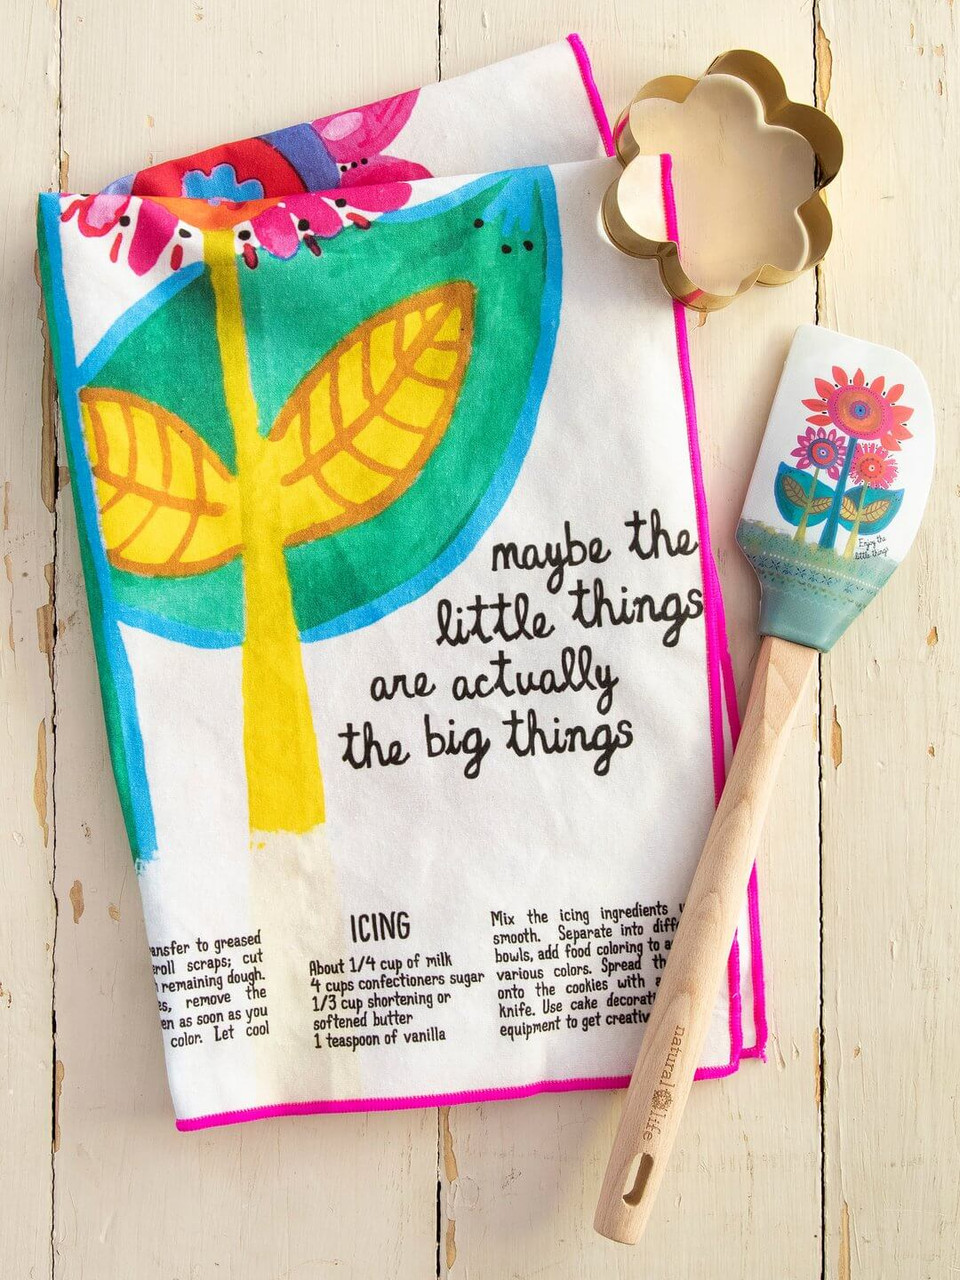 Enjoy the Little Things Baking Gift Set